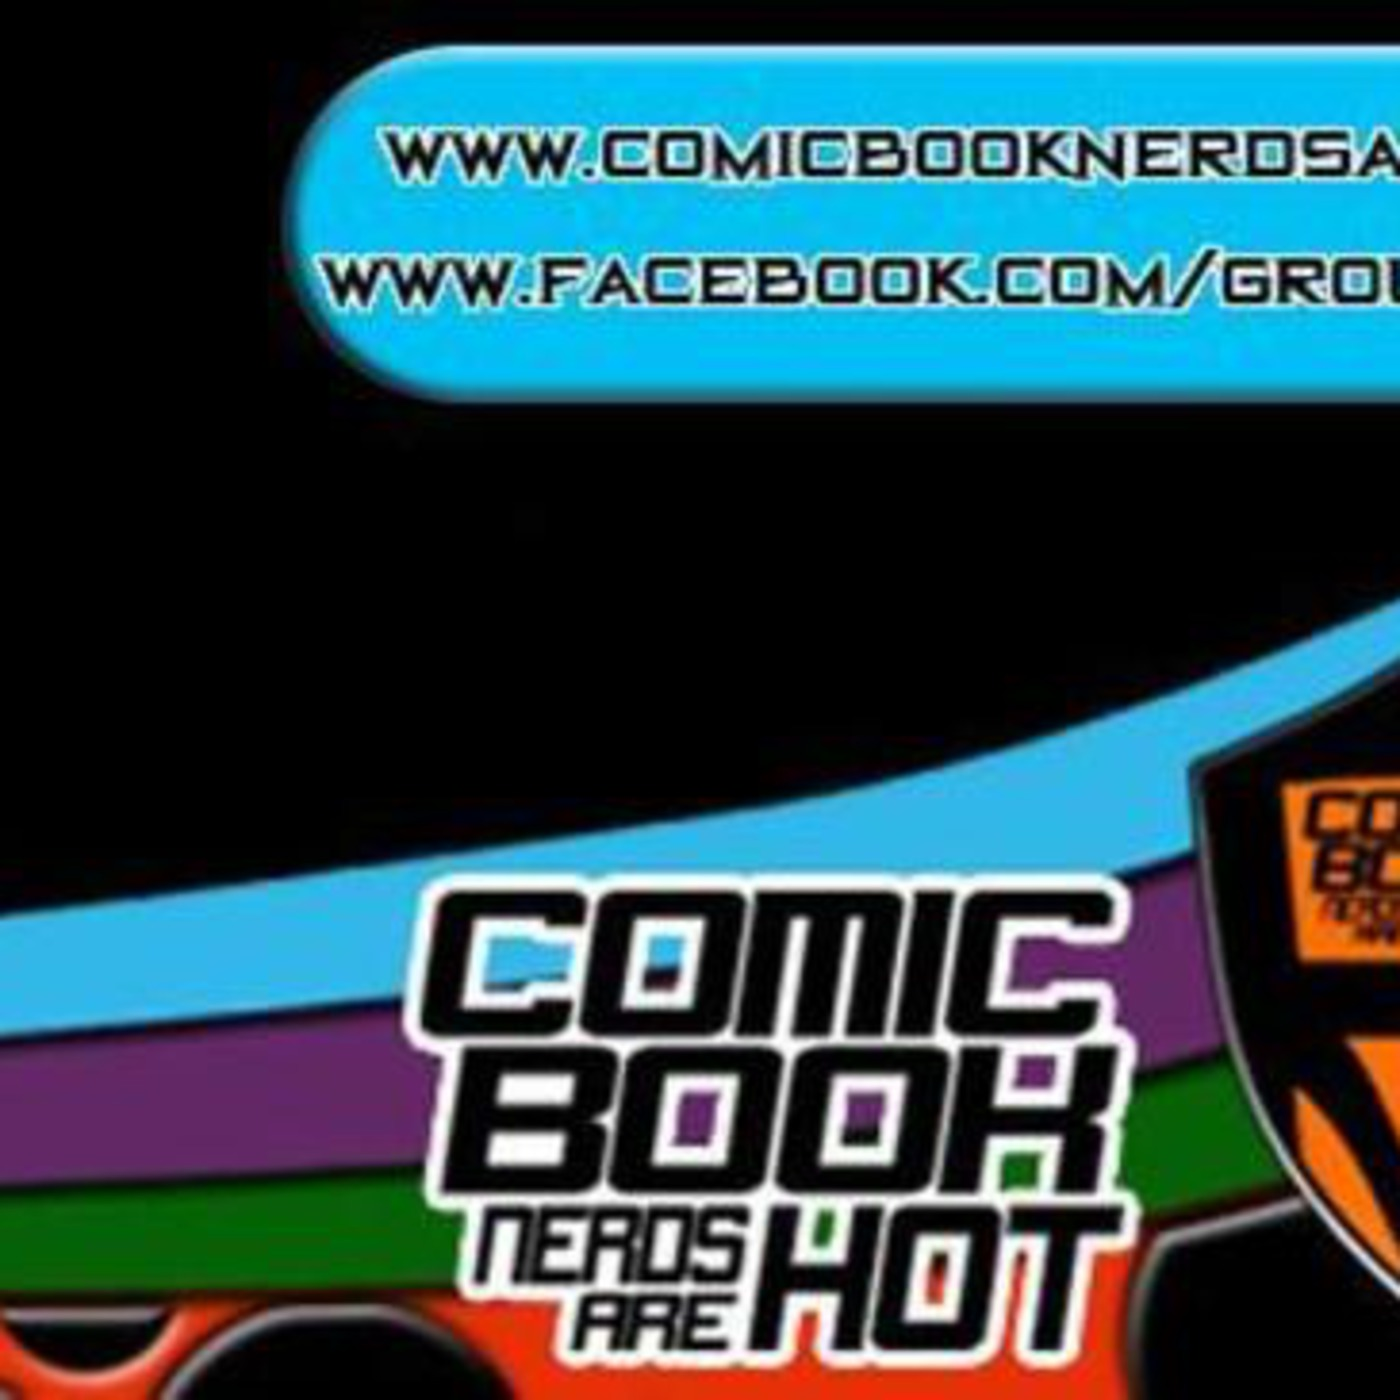 Comic Book Nerds Are Hot